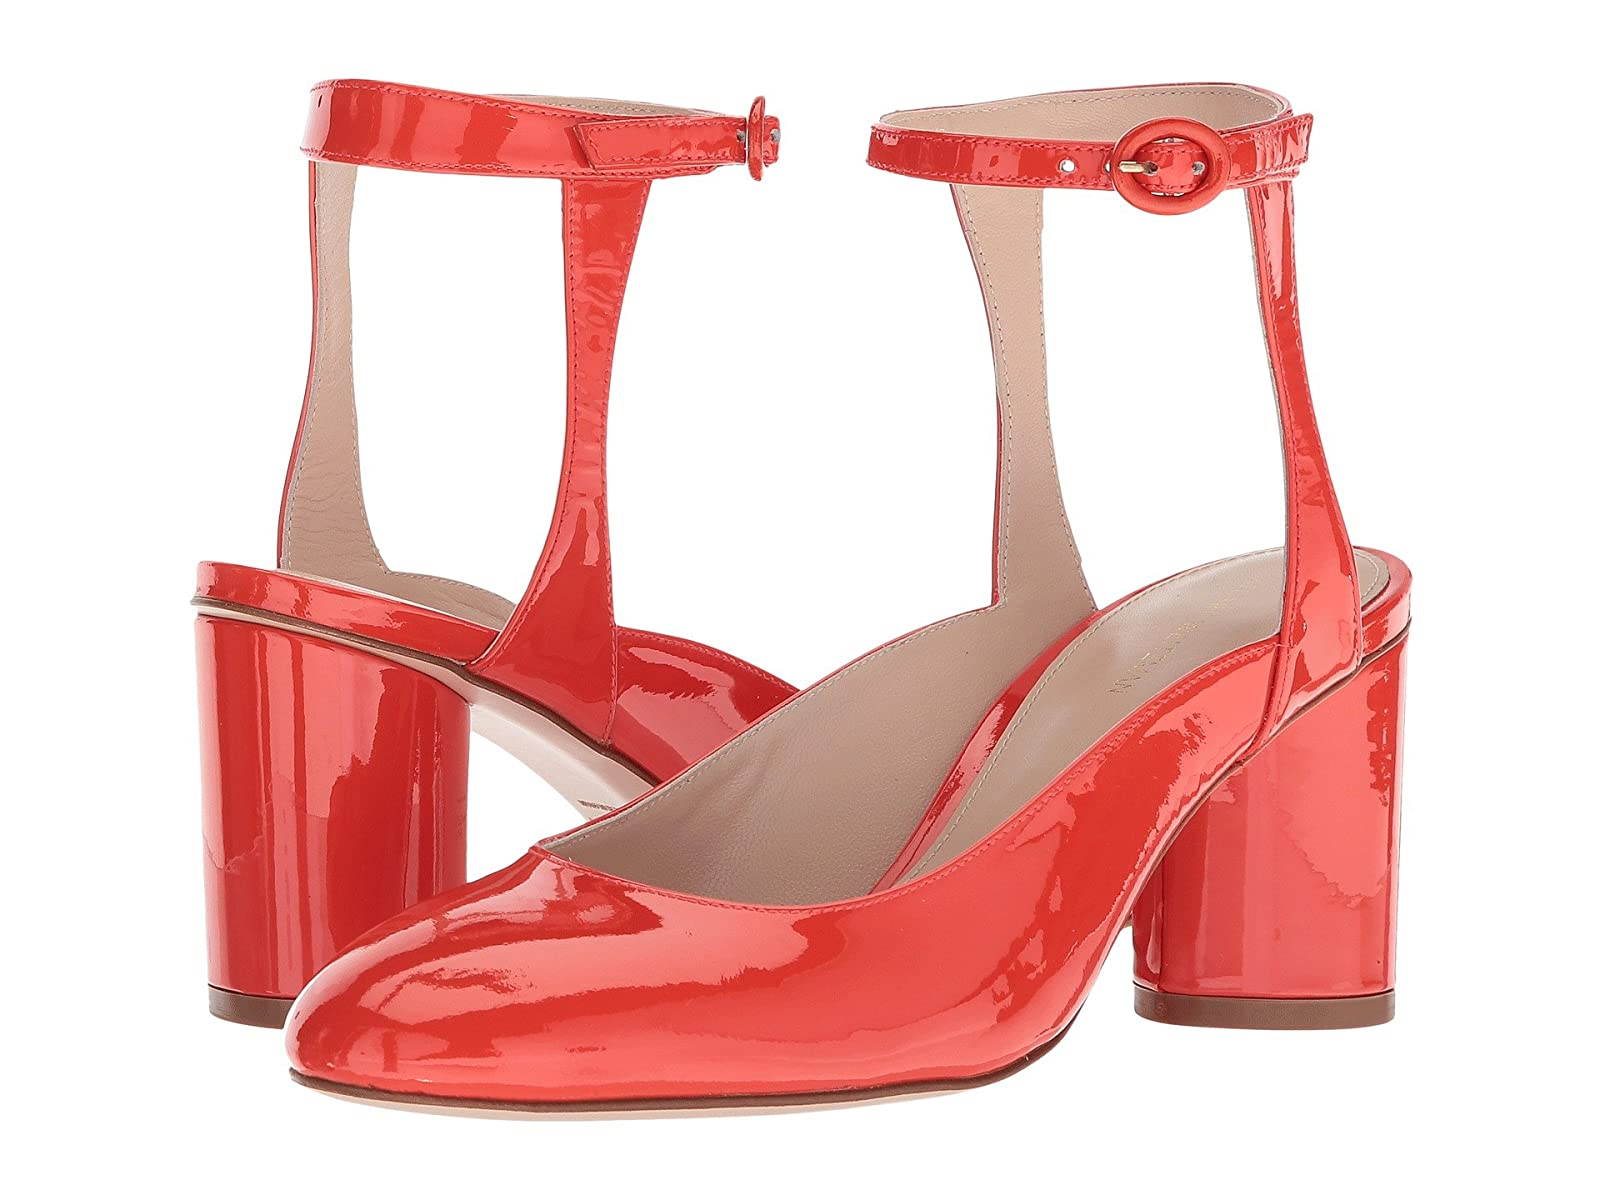 Stuart Weitzman ShapeCheap and distinctive eye-catching shoes